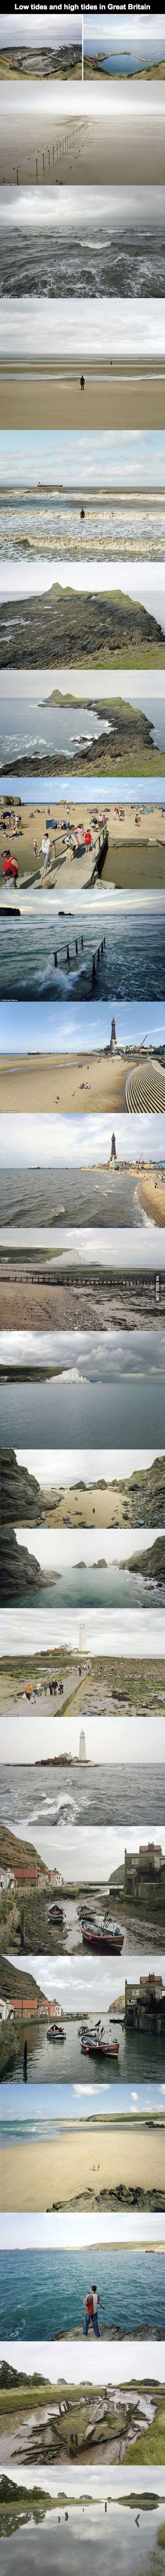 39 best tide pools images on pinterest tide pools teaching low tide vs high tide in britain nvjuhfo Gallery